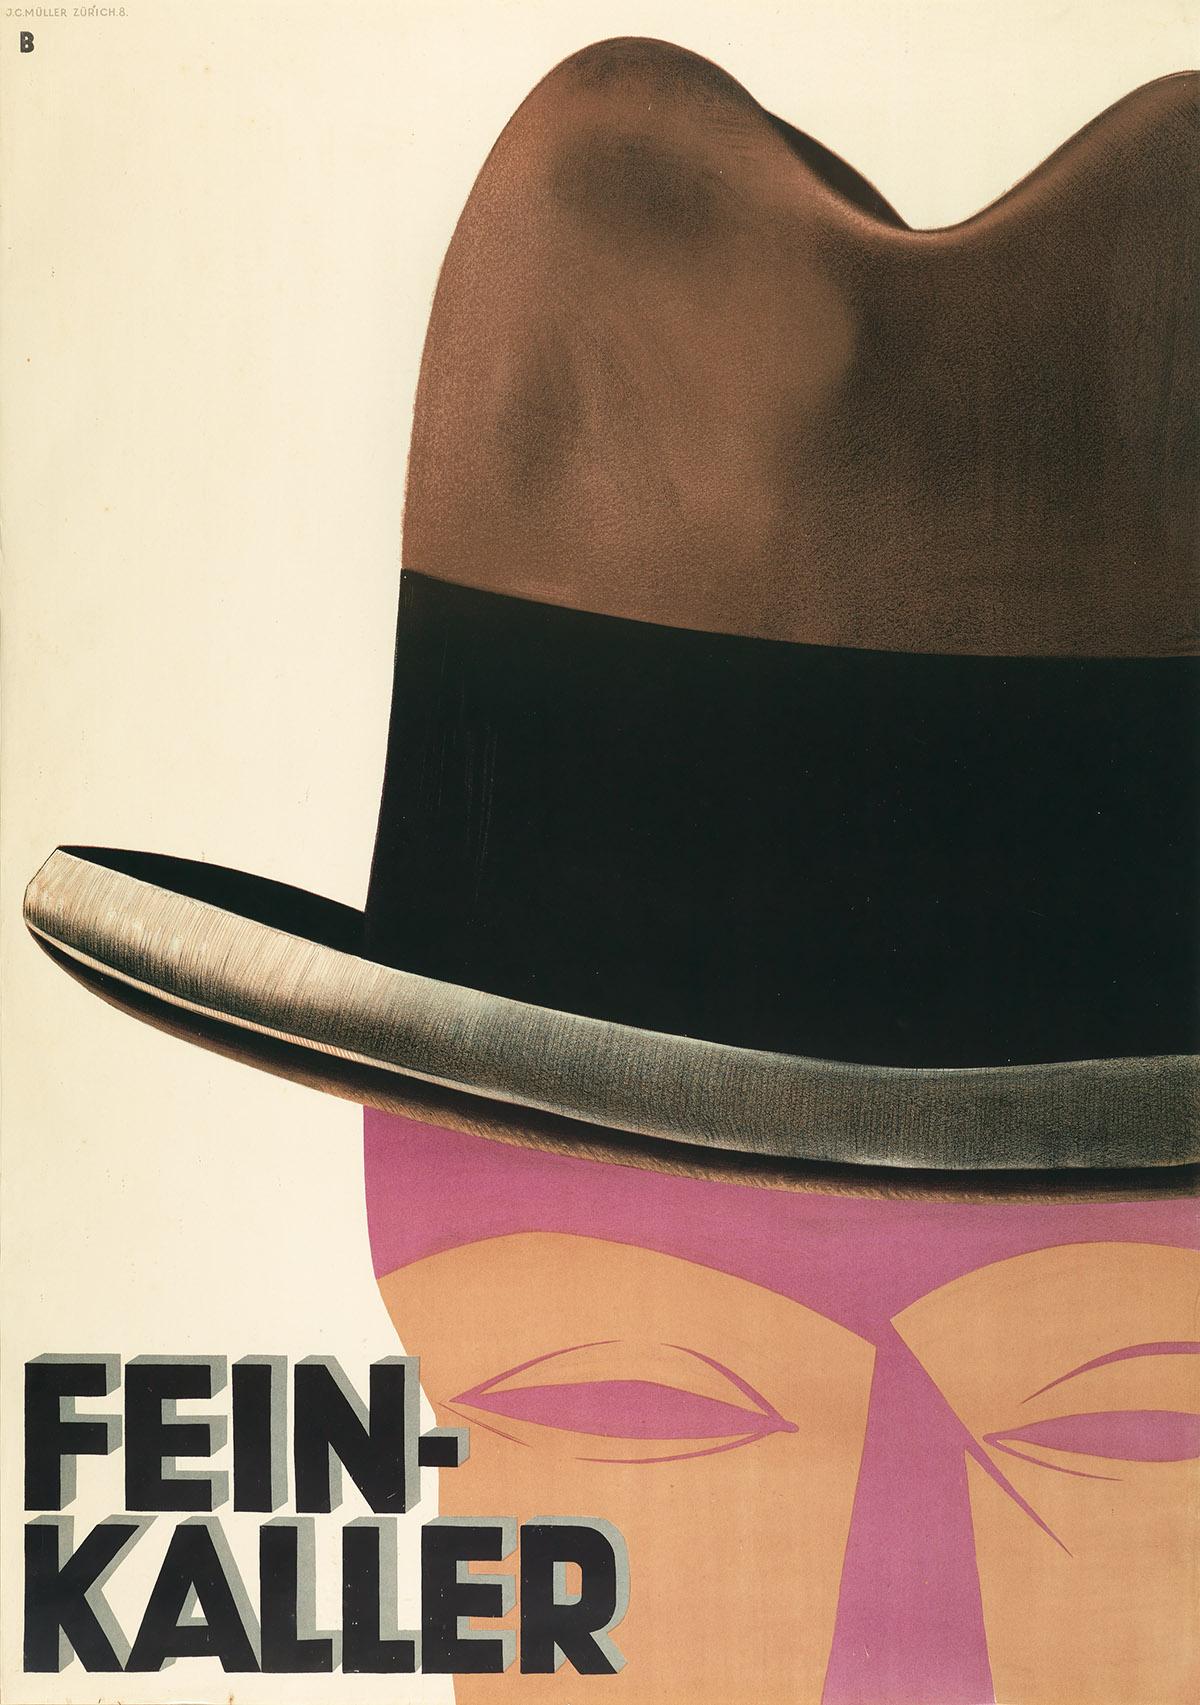 OTTO-BAUMBERGER-(1889-1961)-FEIN---KALLER-1930-50x35-inches-